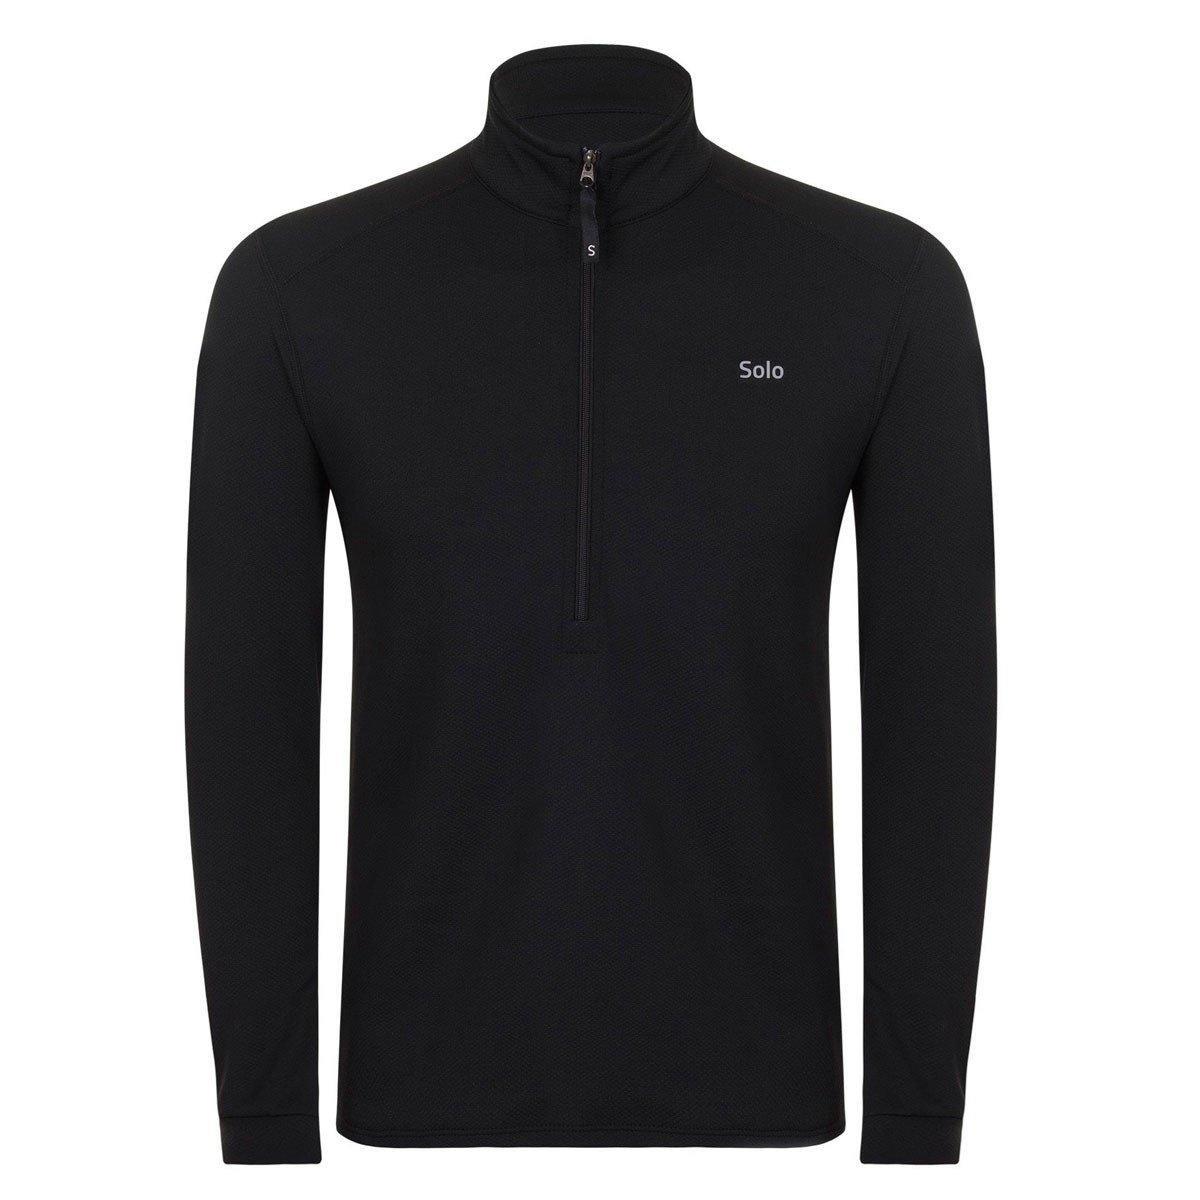 Jaqueta Blusa Solo X - Thermo DS Zip Masculina - Compre Agora  da1806c49a28a